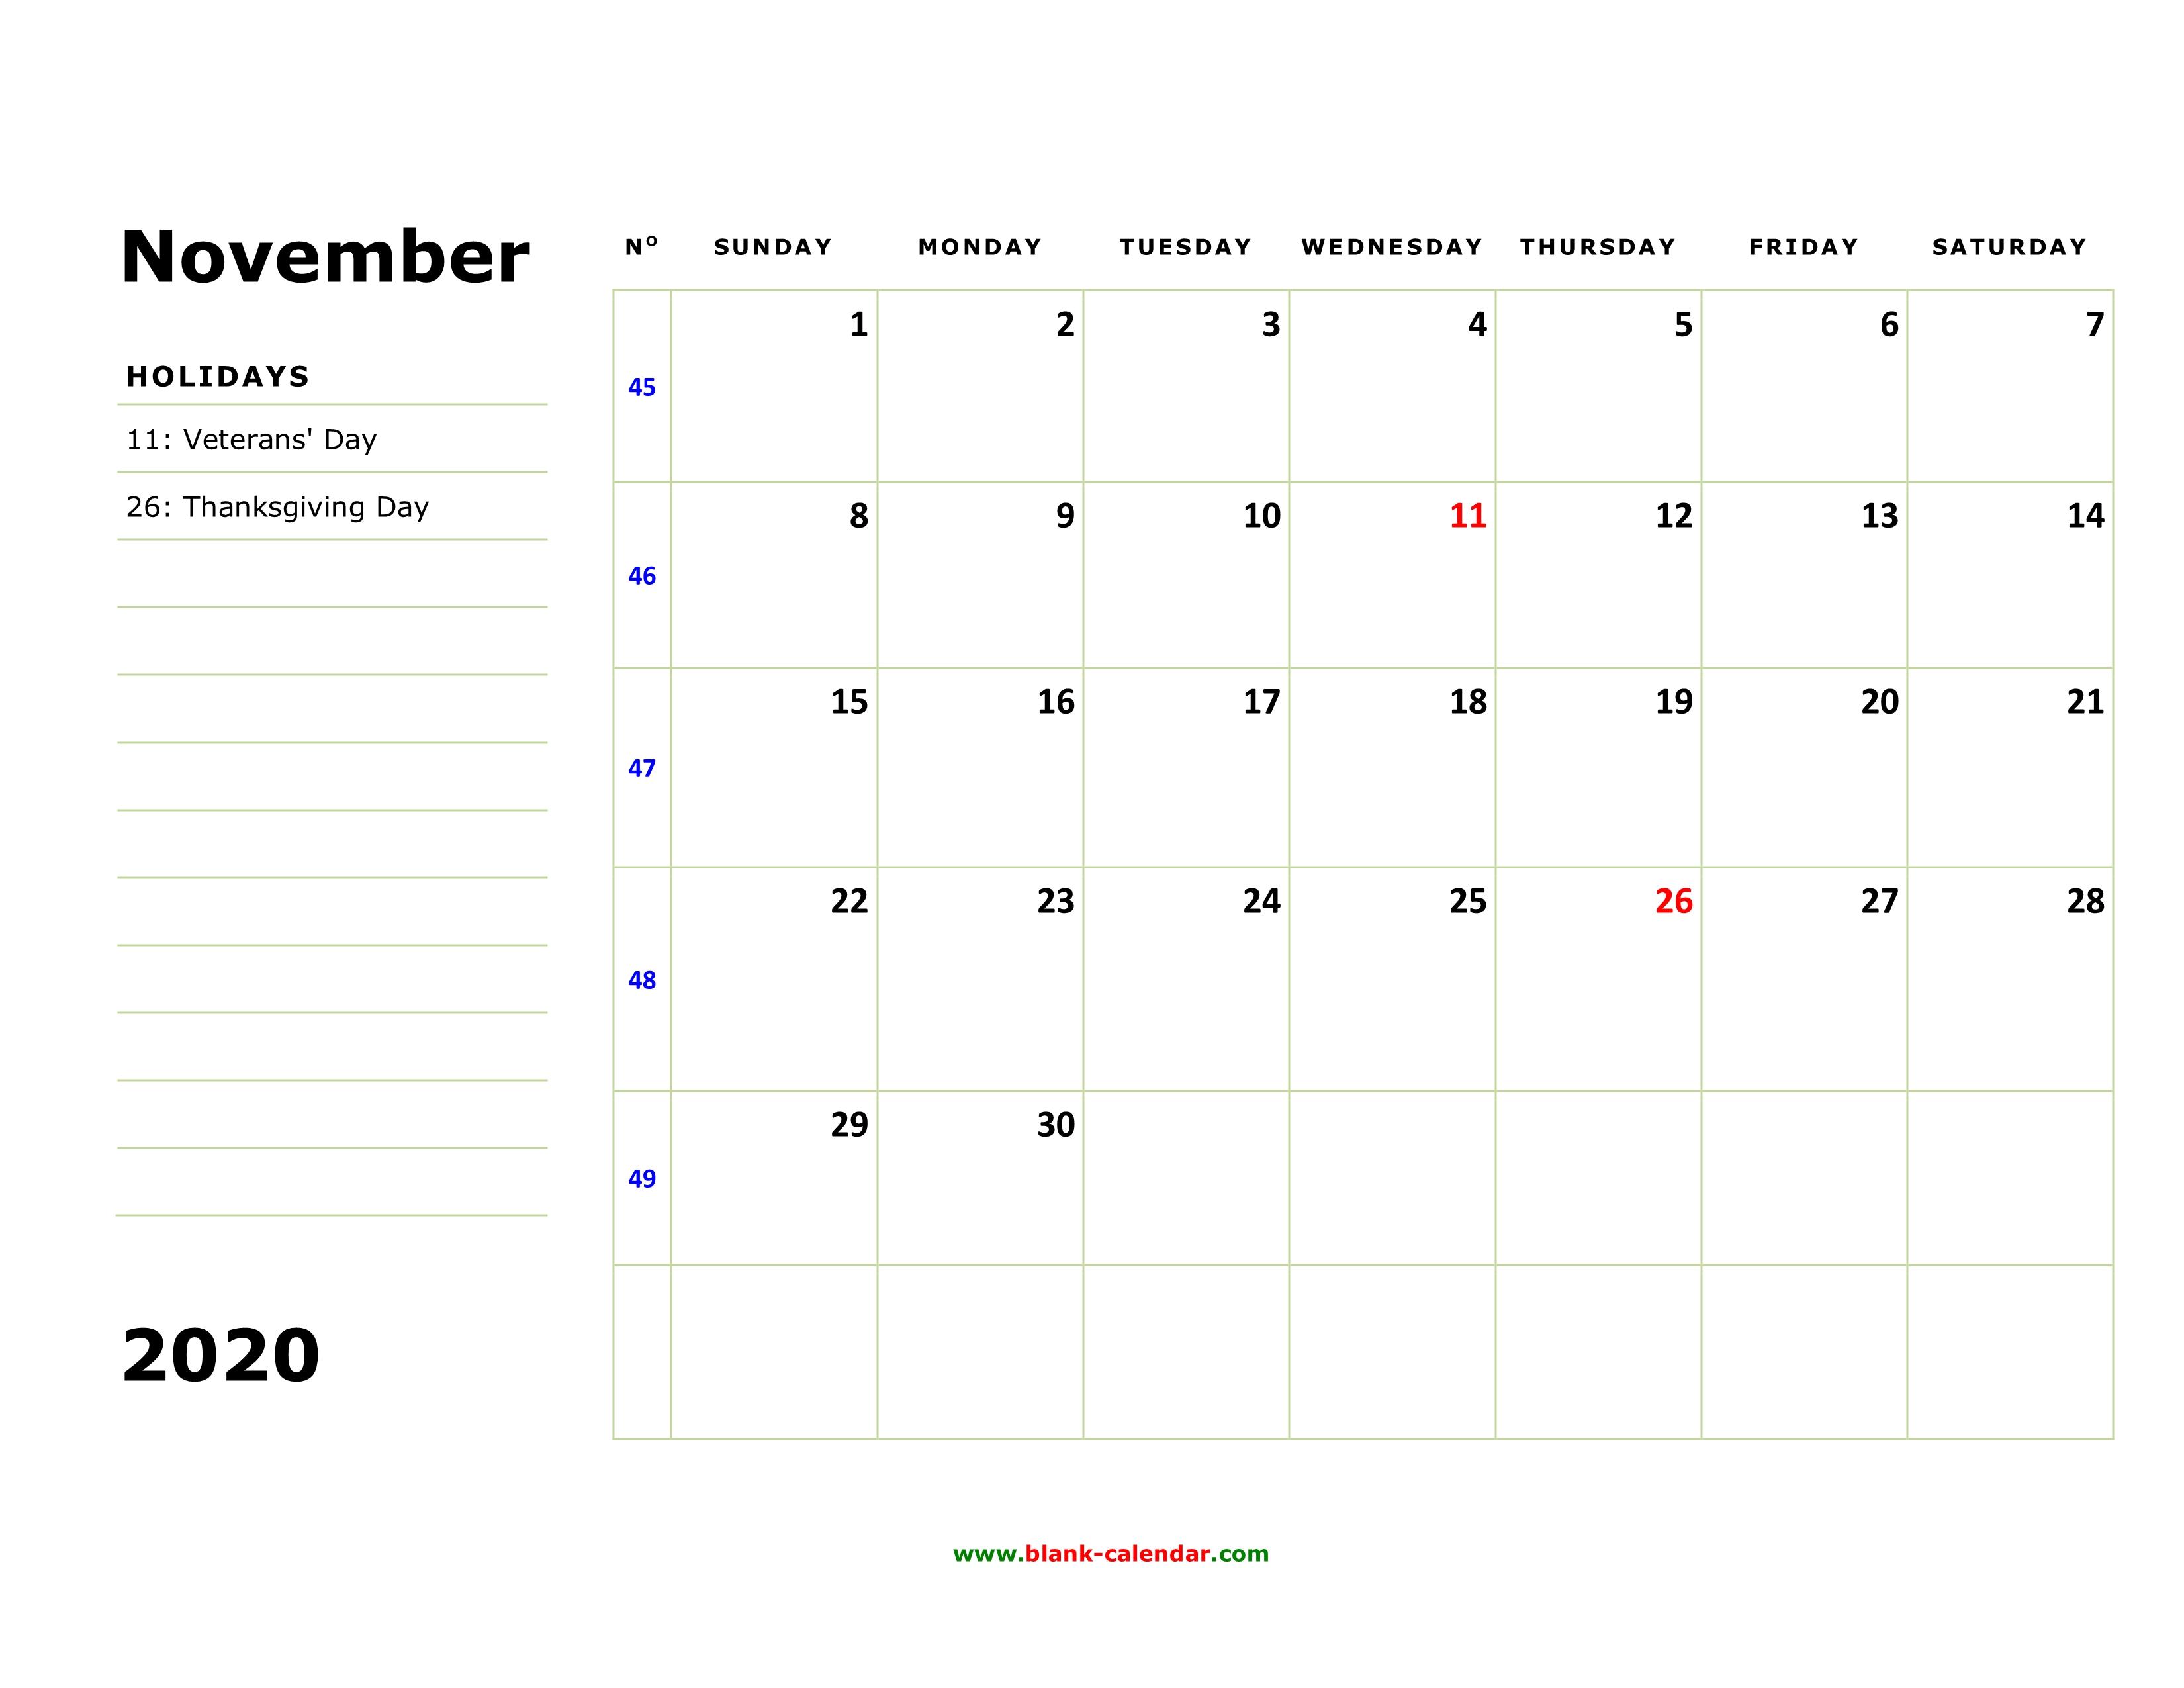 November 2020 Calendar Printable.Free Download Printable November 2020 Calendar Large Box Holidays